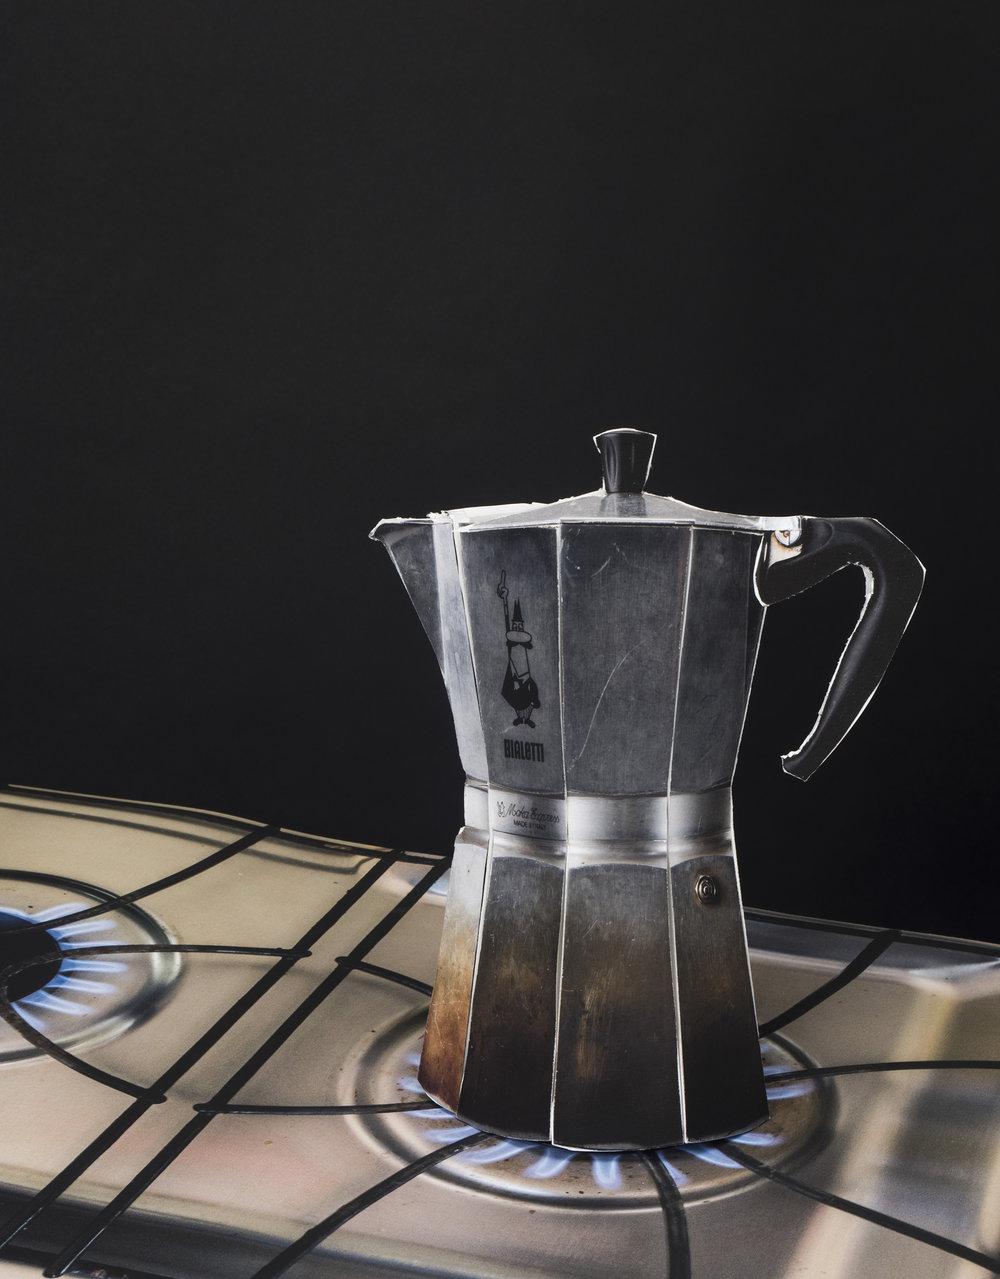 Espresso122016886.jpg